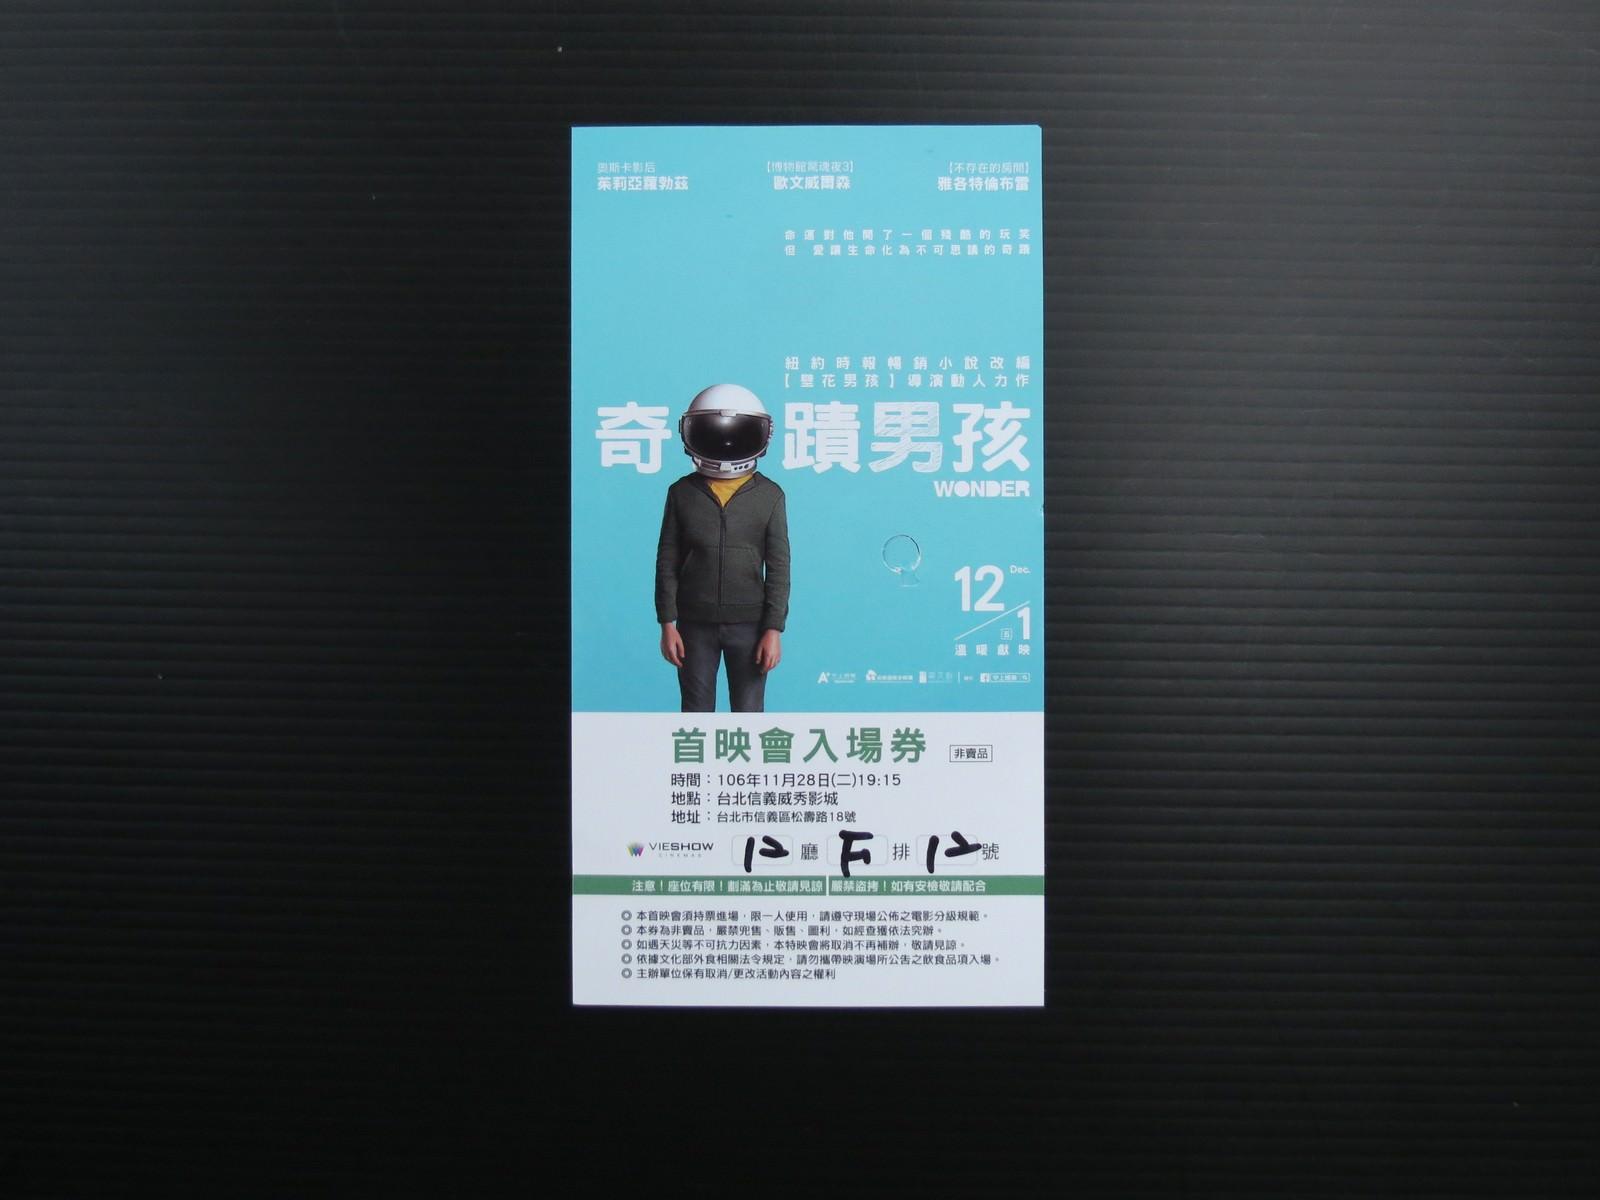 Movie, Wonder(美國, 2017年) / 奇蹟男孩(台灣.香港) / 奇迹男孩(中國), 特映電影票